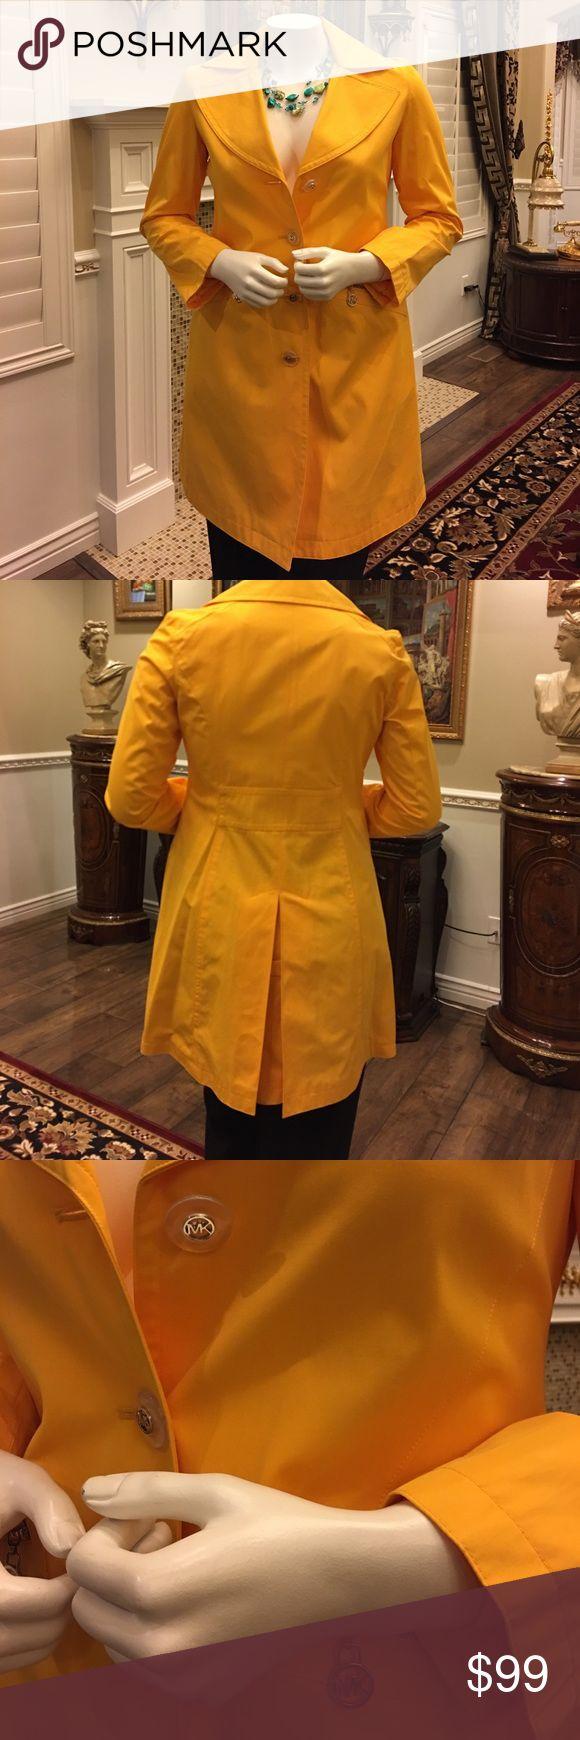 Michael Kors rain jacket Bright yellow MK jacket never worn MICHAEL Michael Kors Jackets & Coats